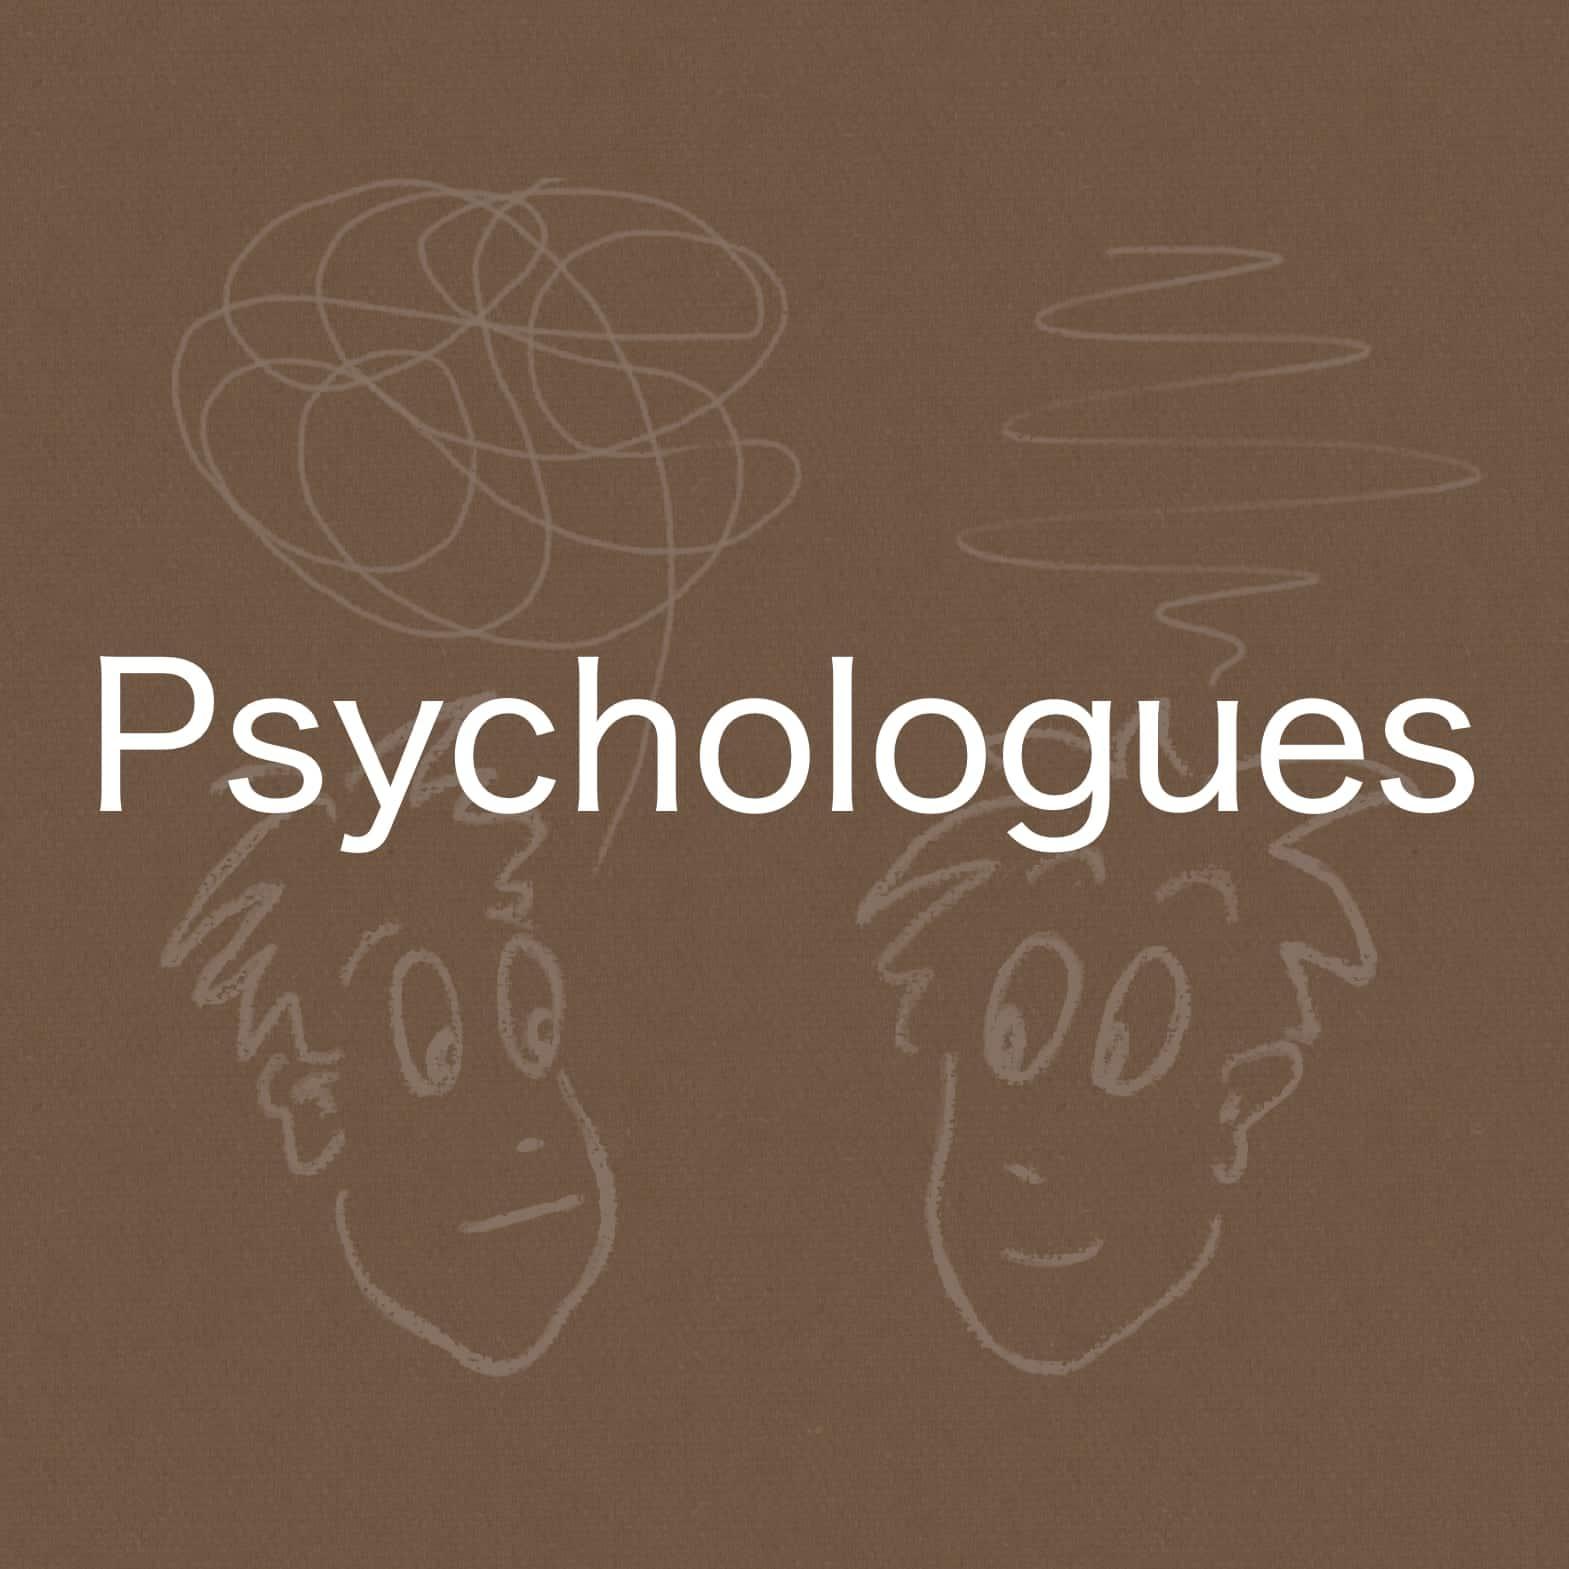 Psychologues Hover logo site